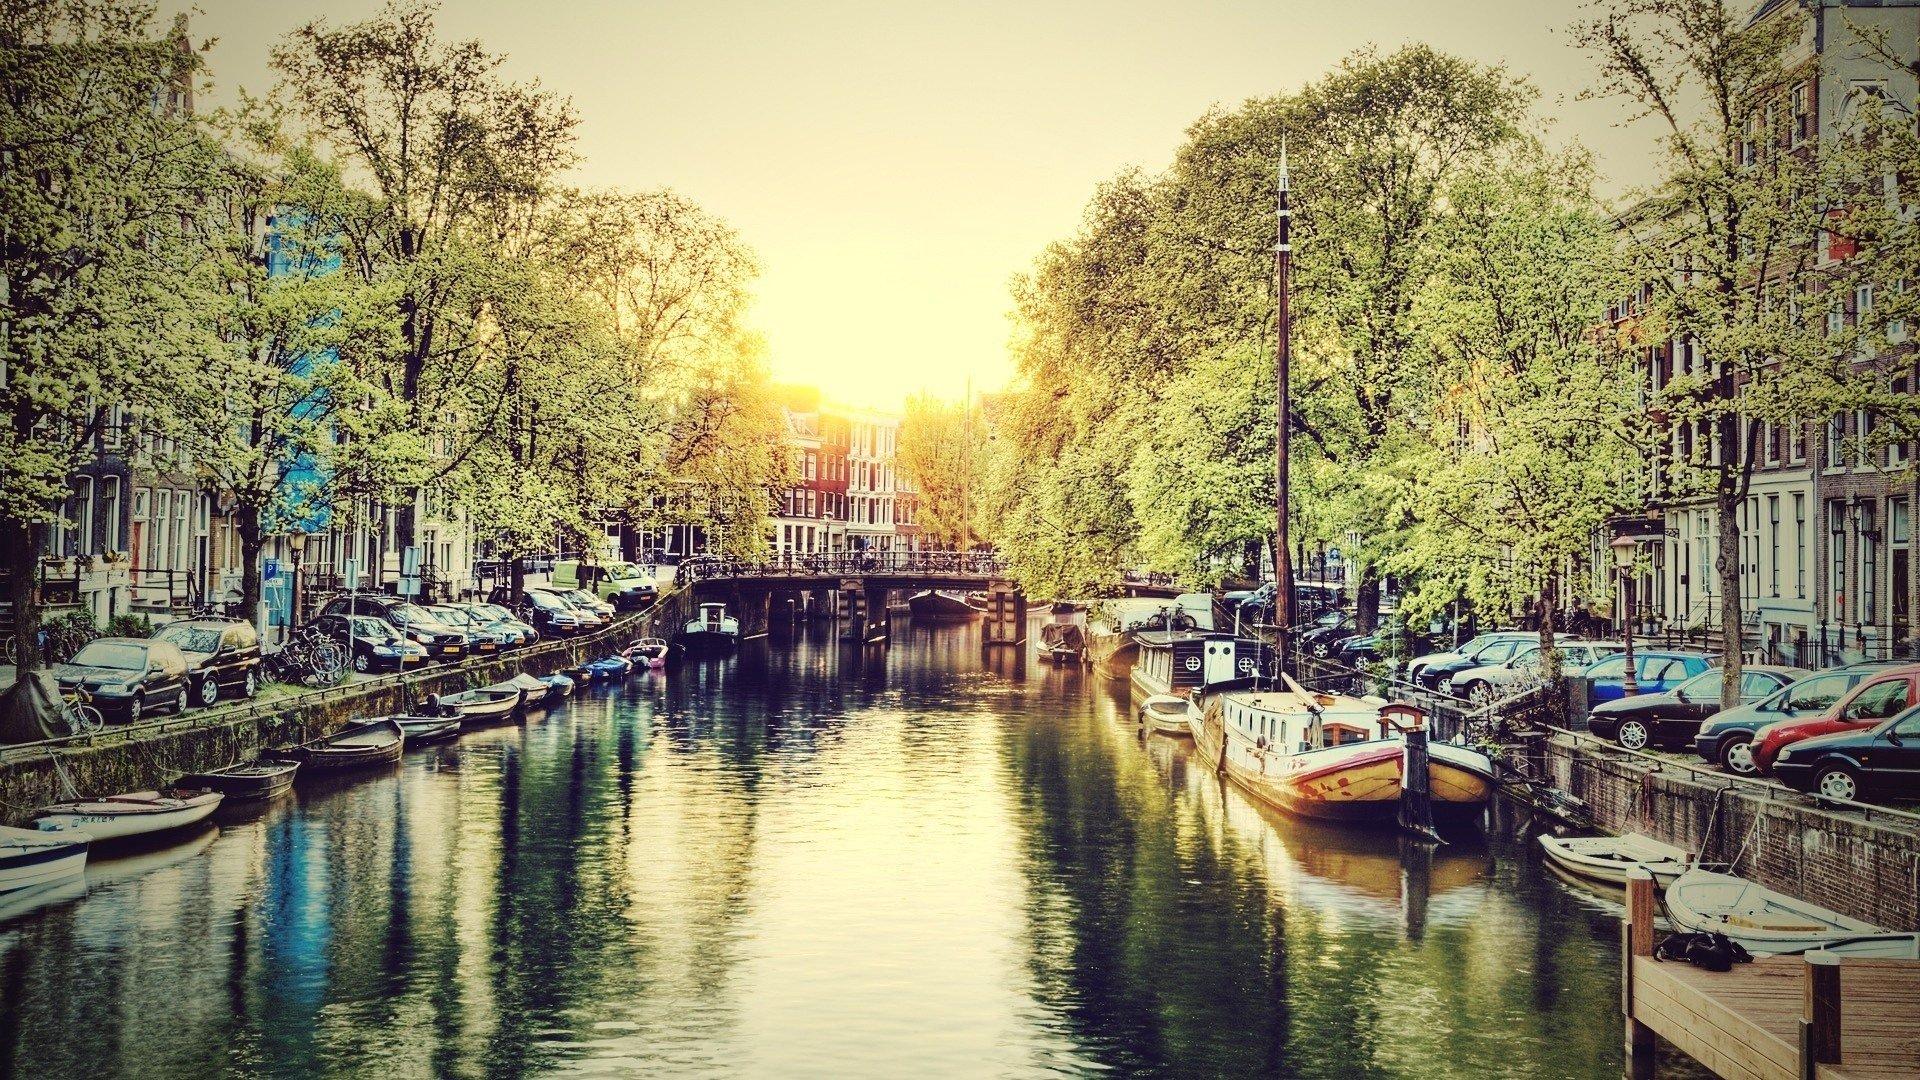 Wallpaper 1920x1080 Px Amsterdam Canal Summer Water